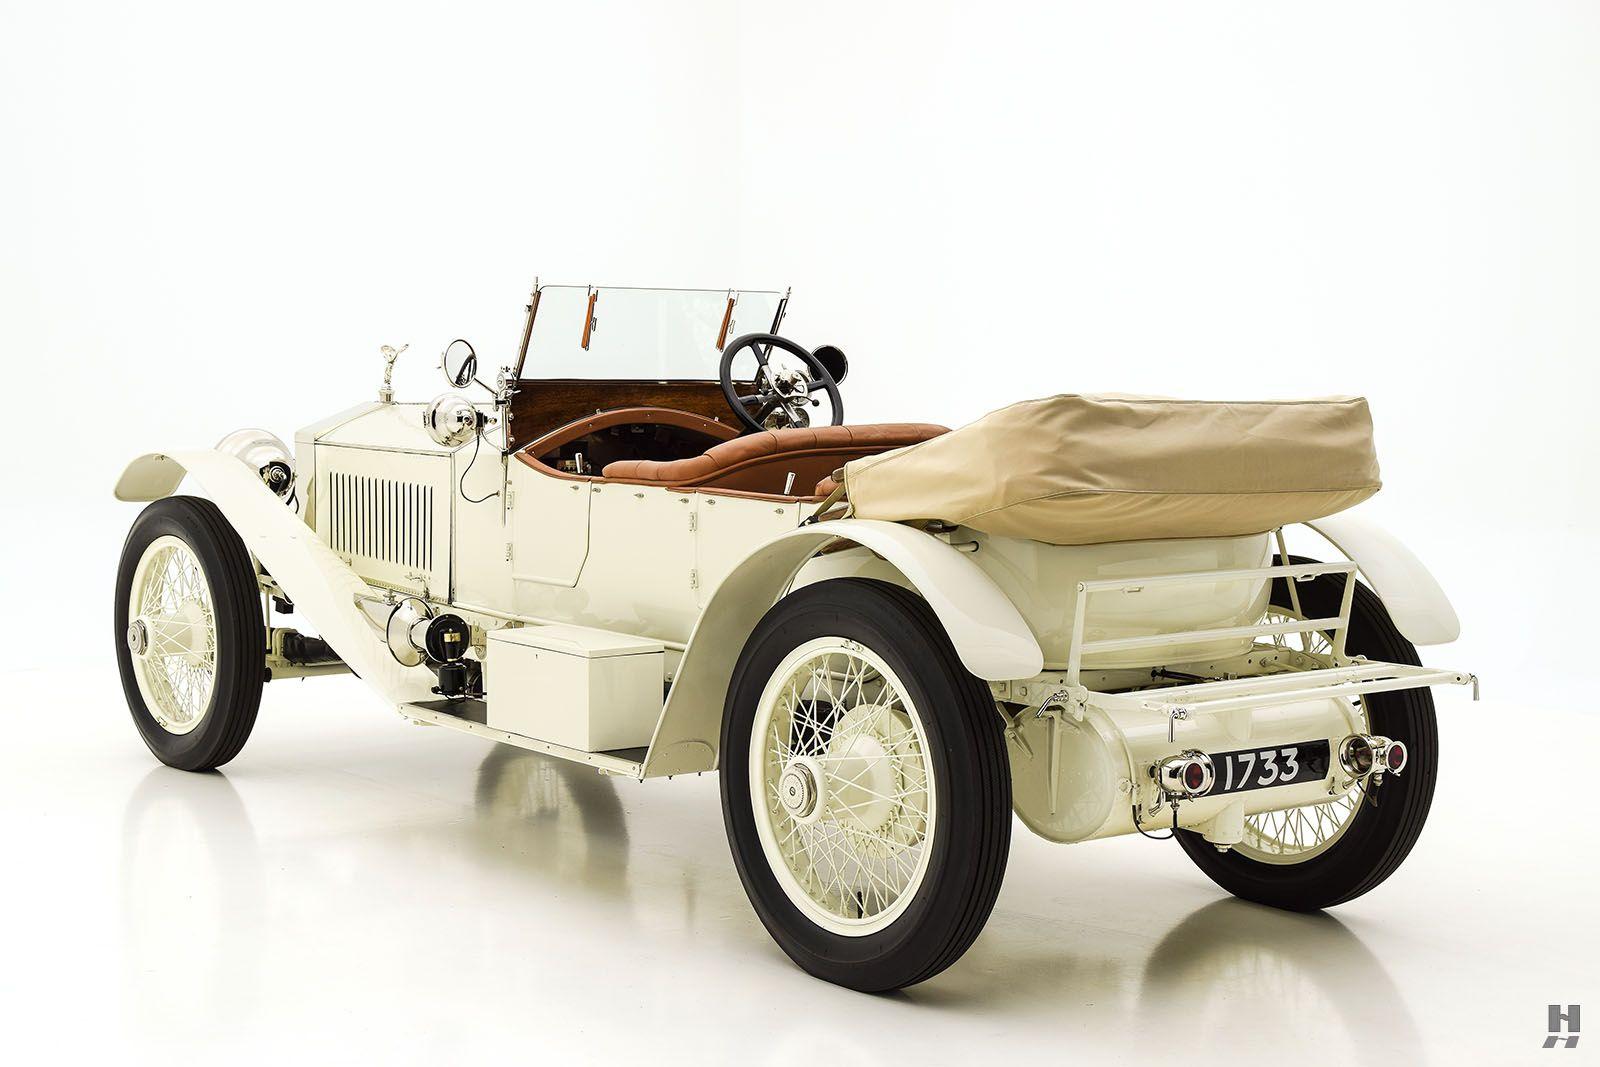 1913 RollsRoyce Silver Ghost Sports Tourer Classic Car